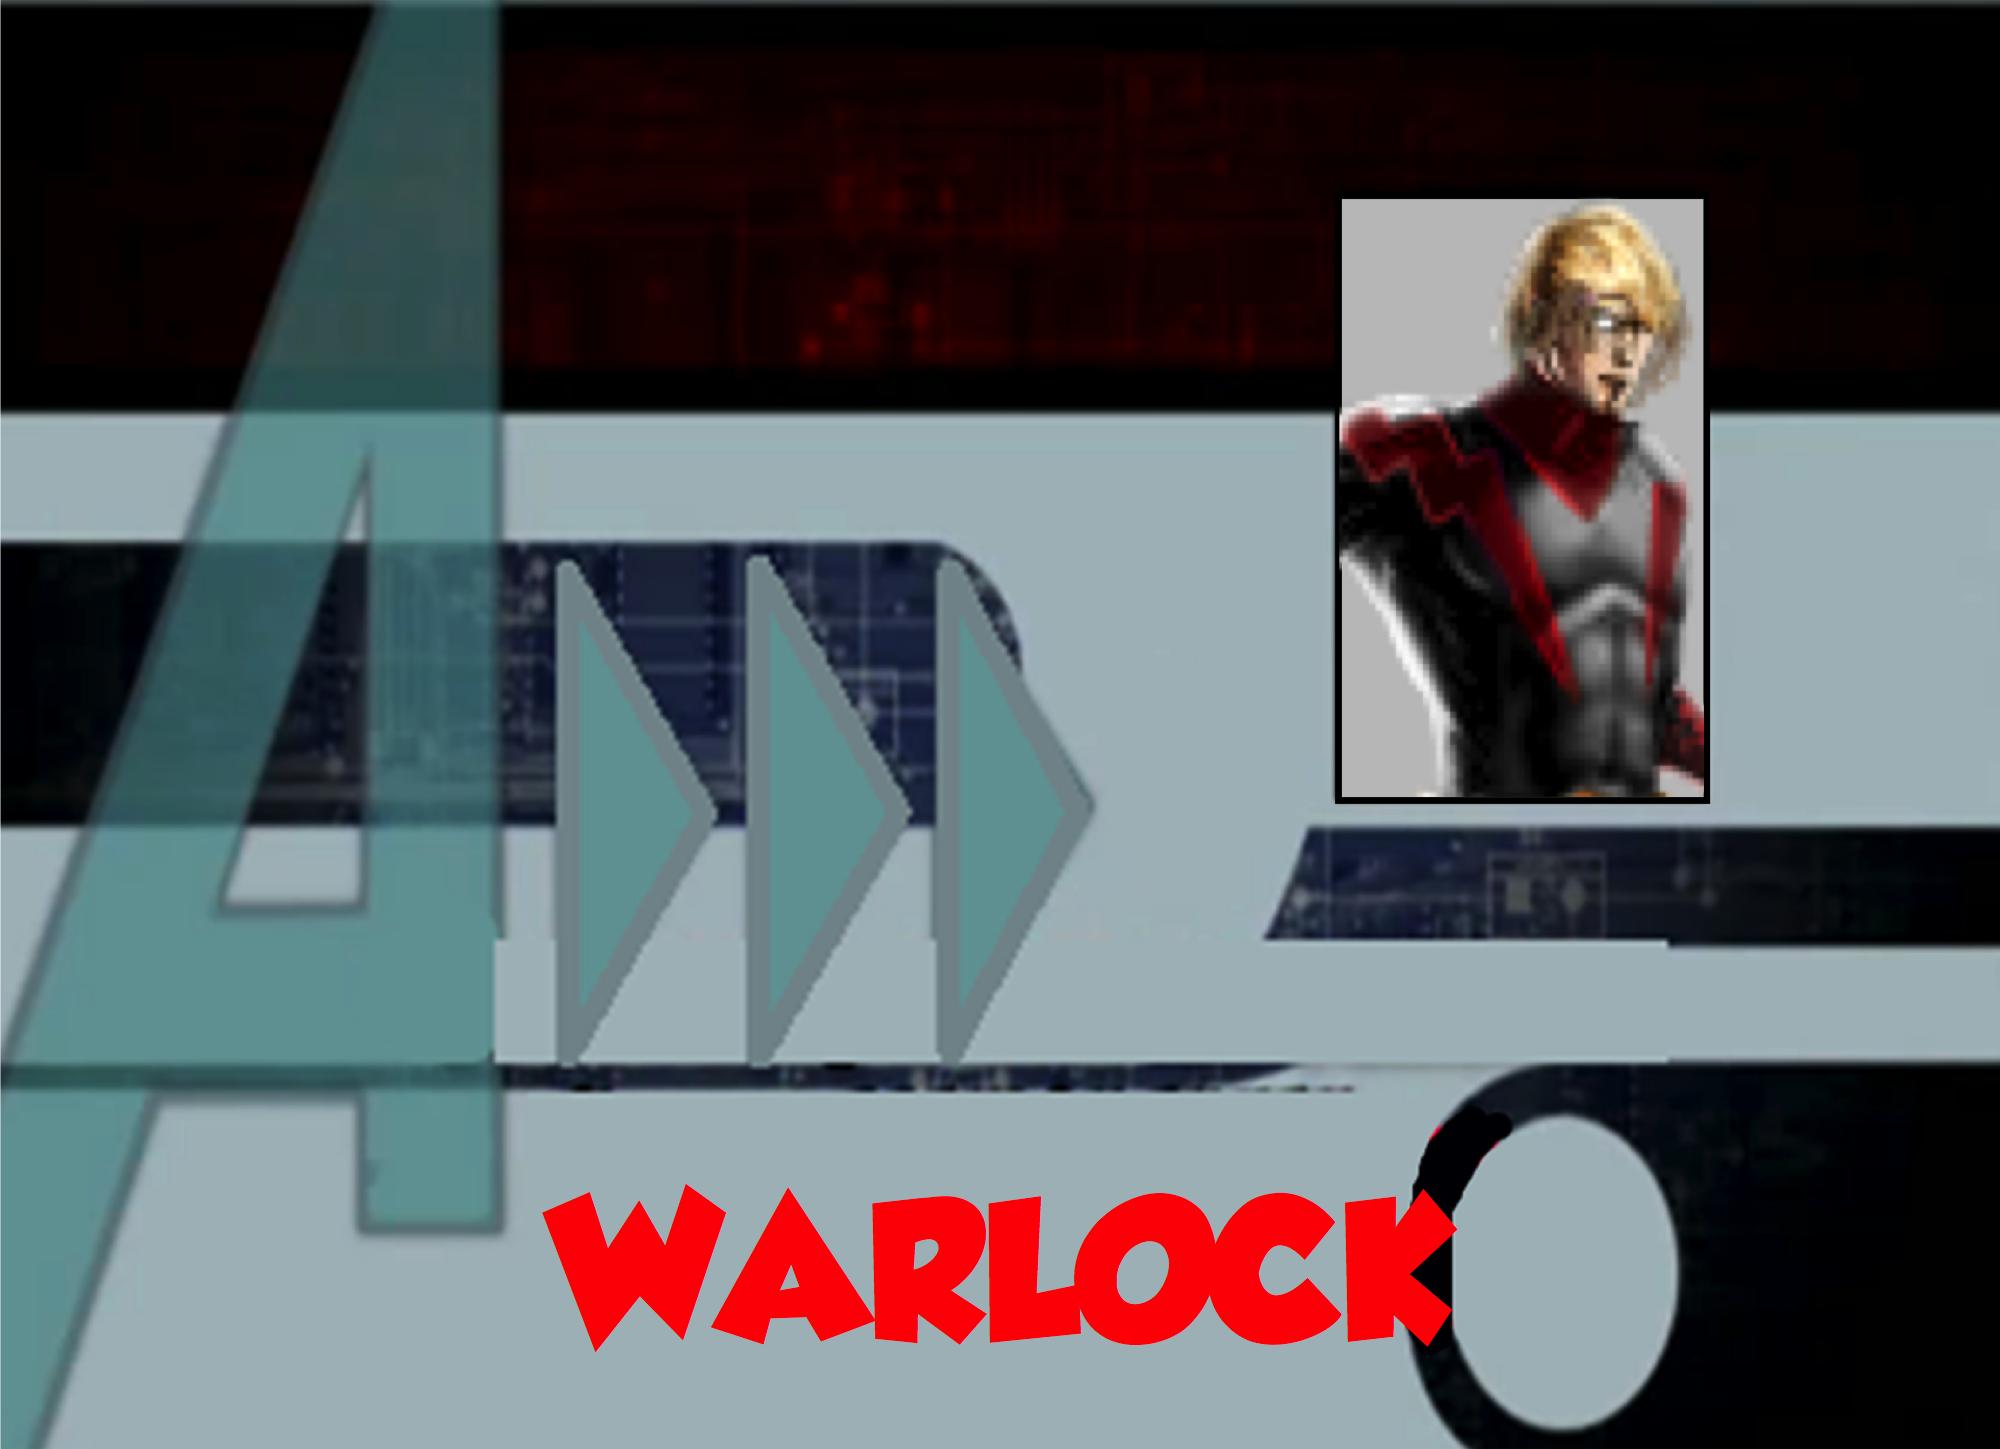 Warlock (A!)